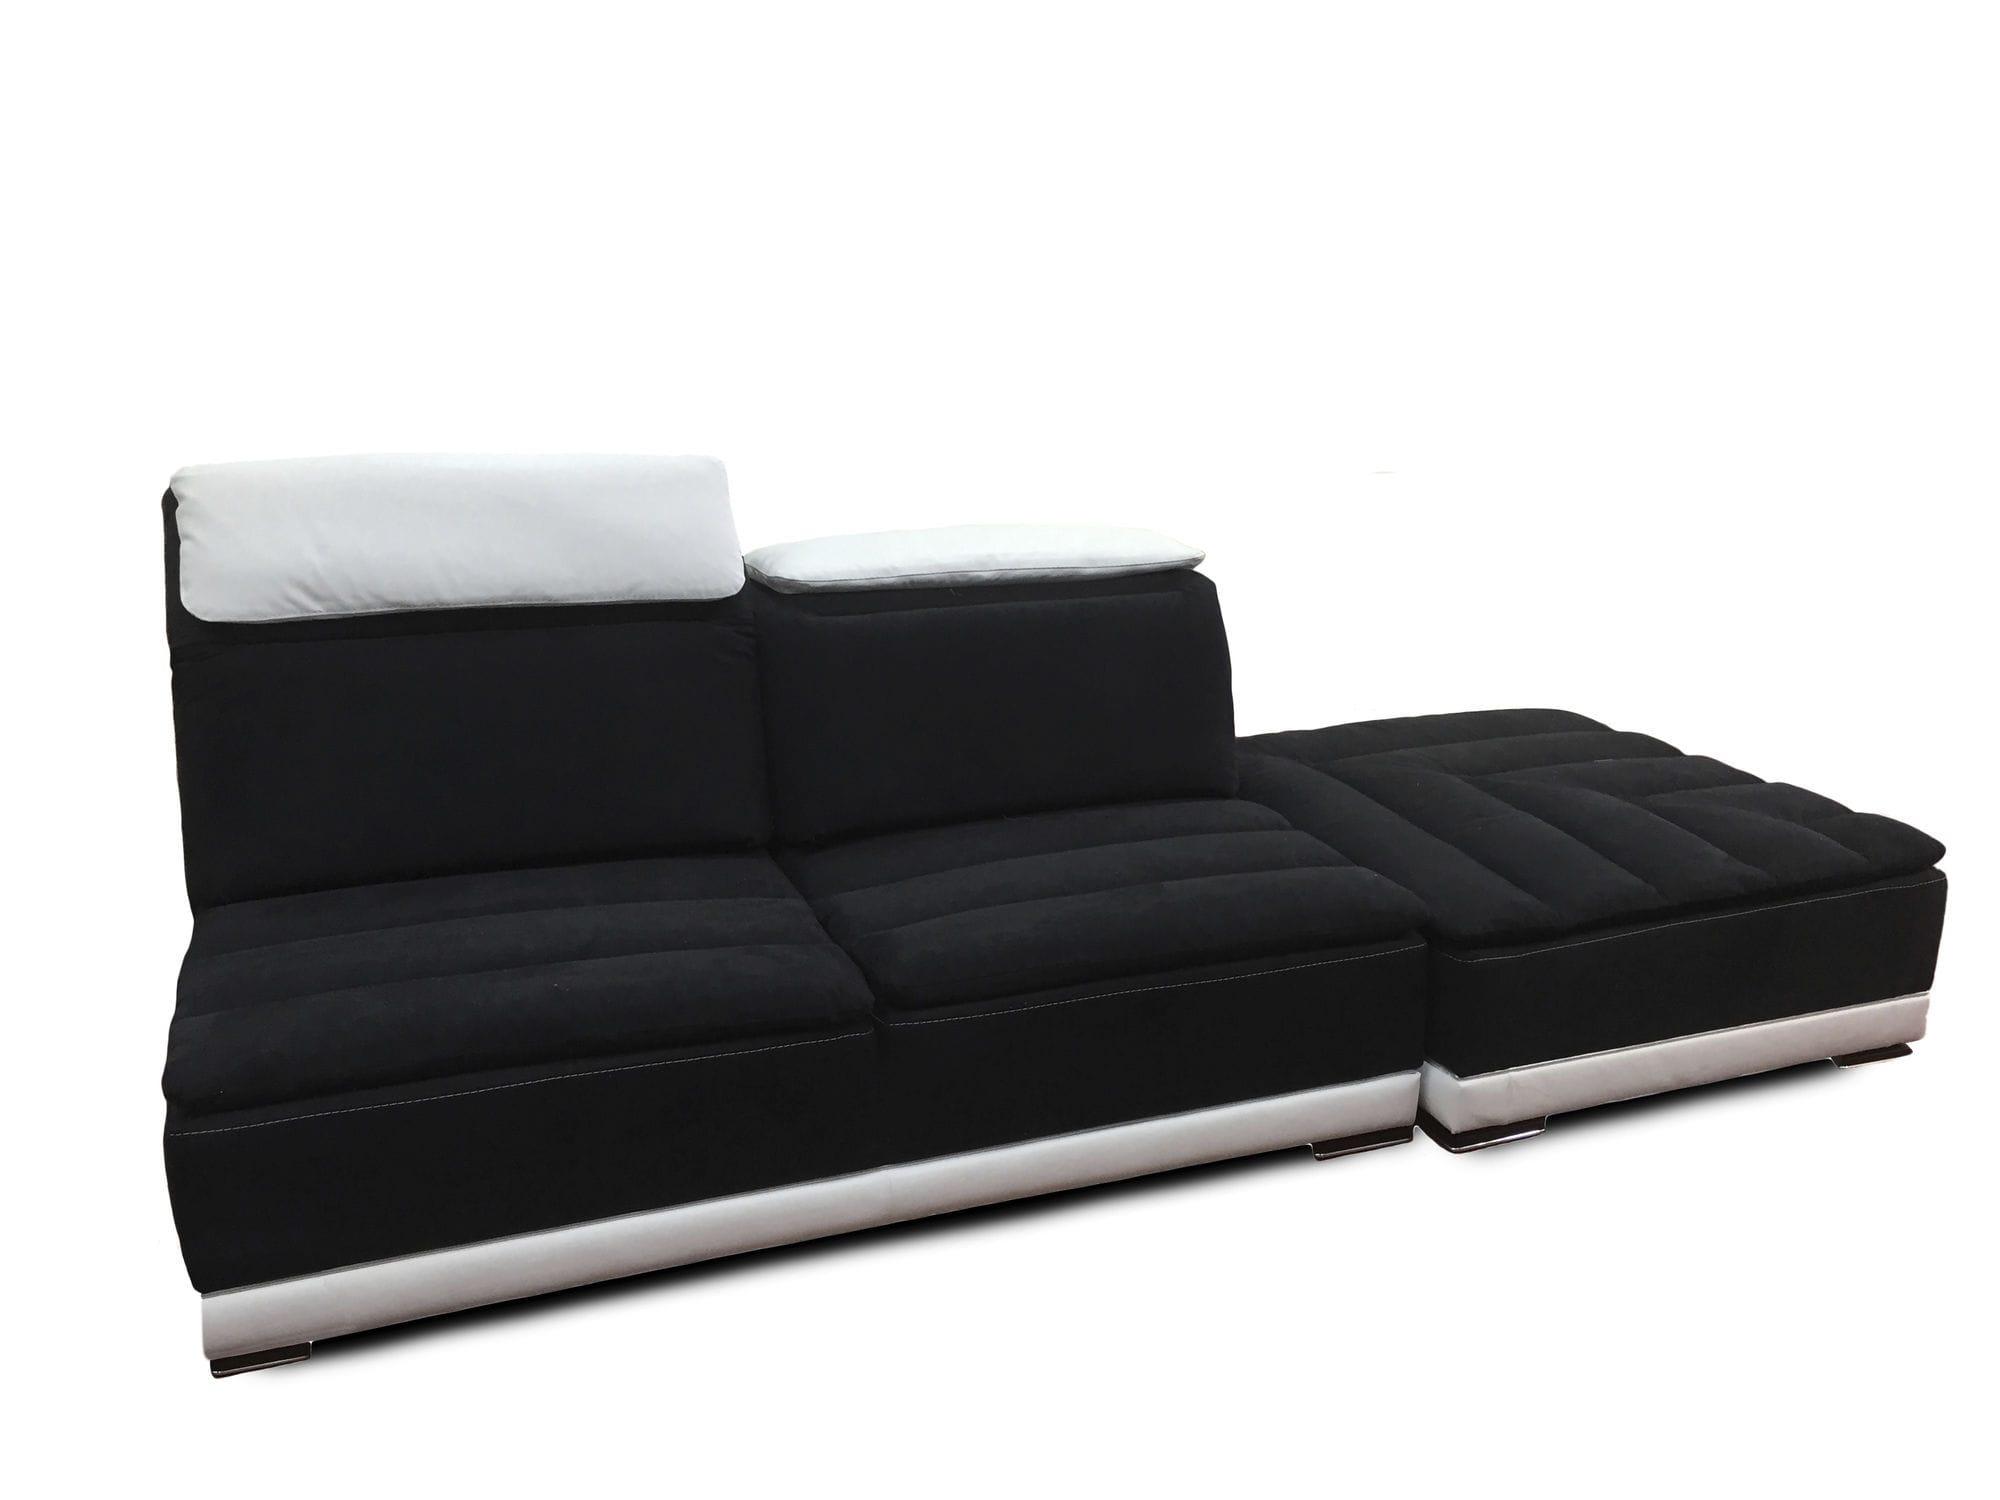 corner sofa fabric 7 seater and more california nieri - Corner Sofa